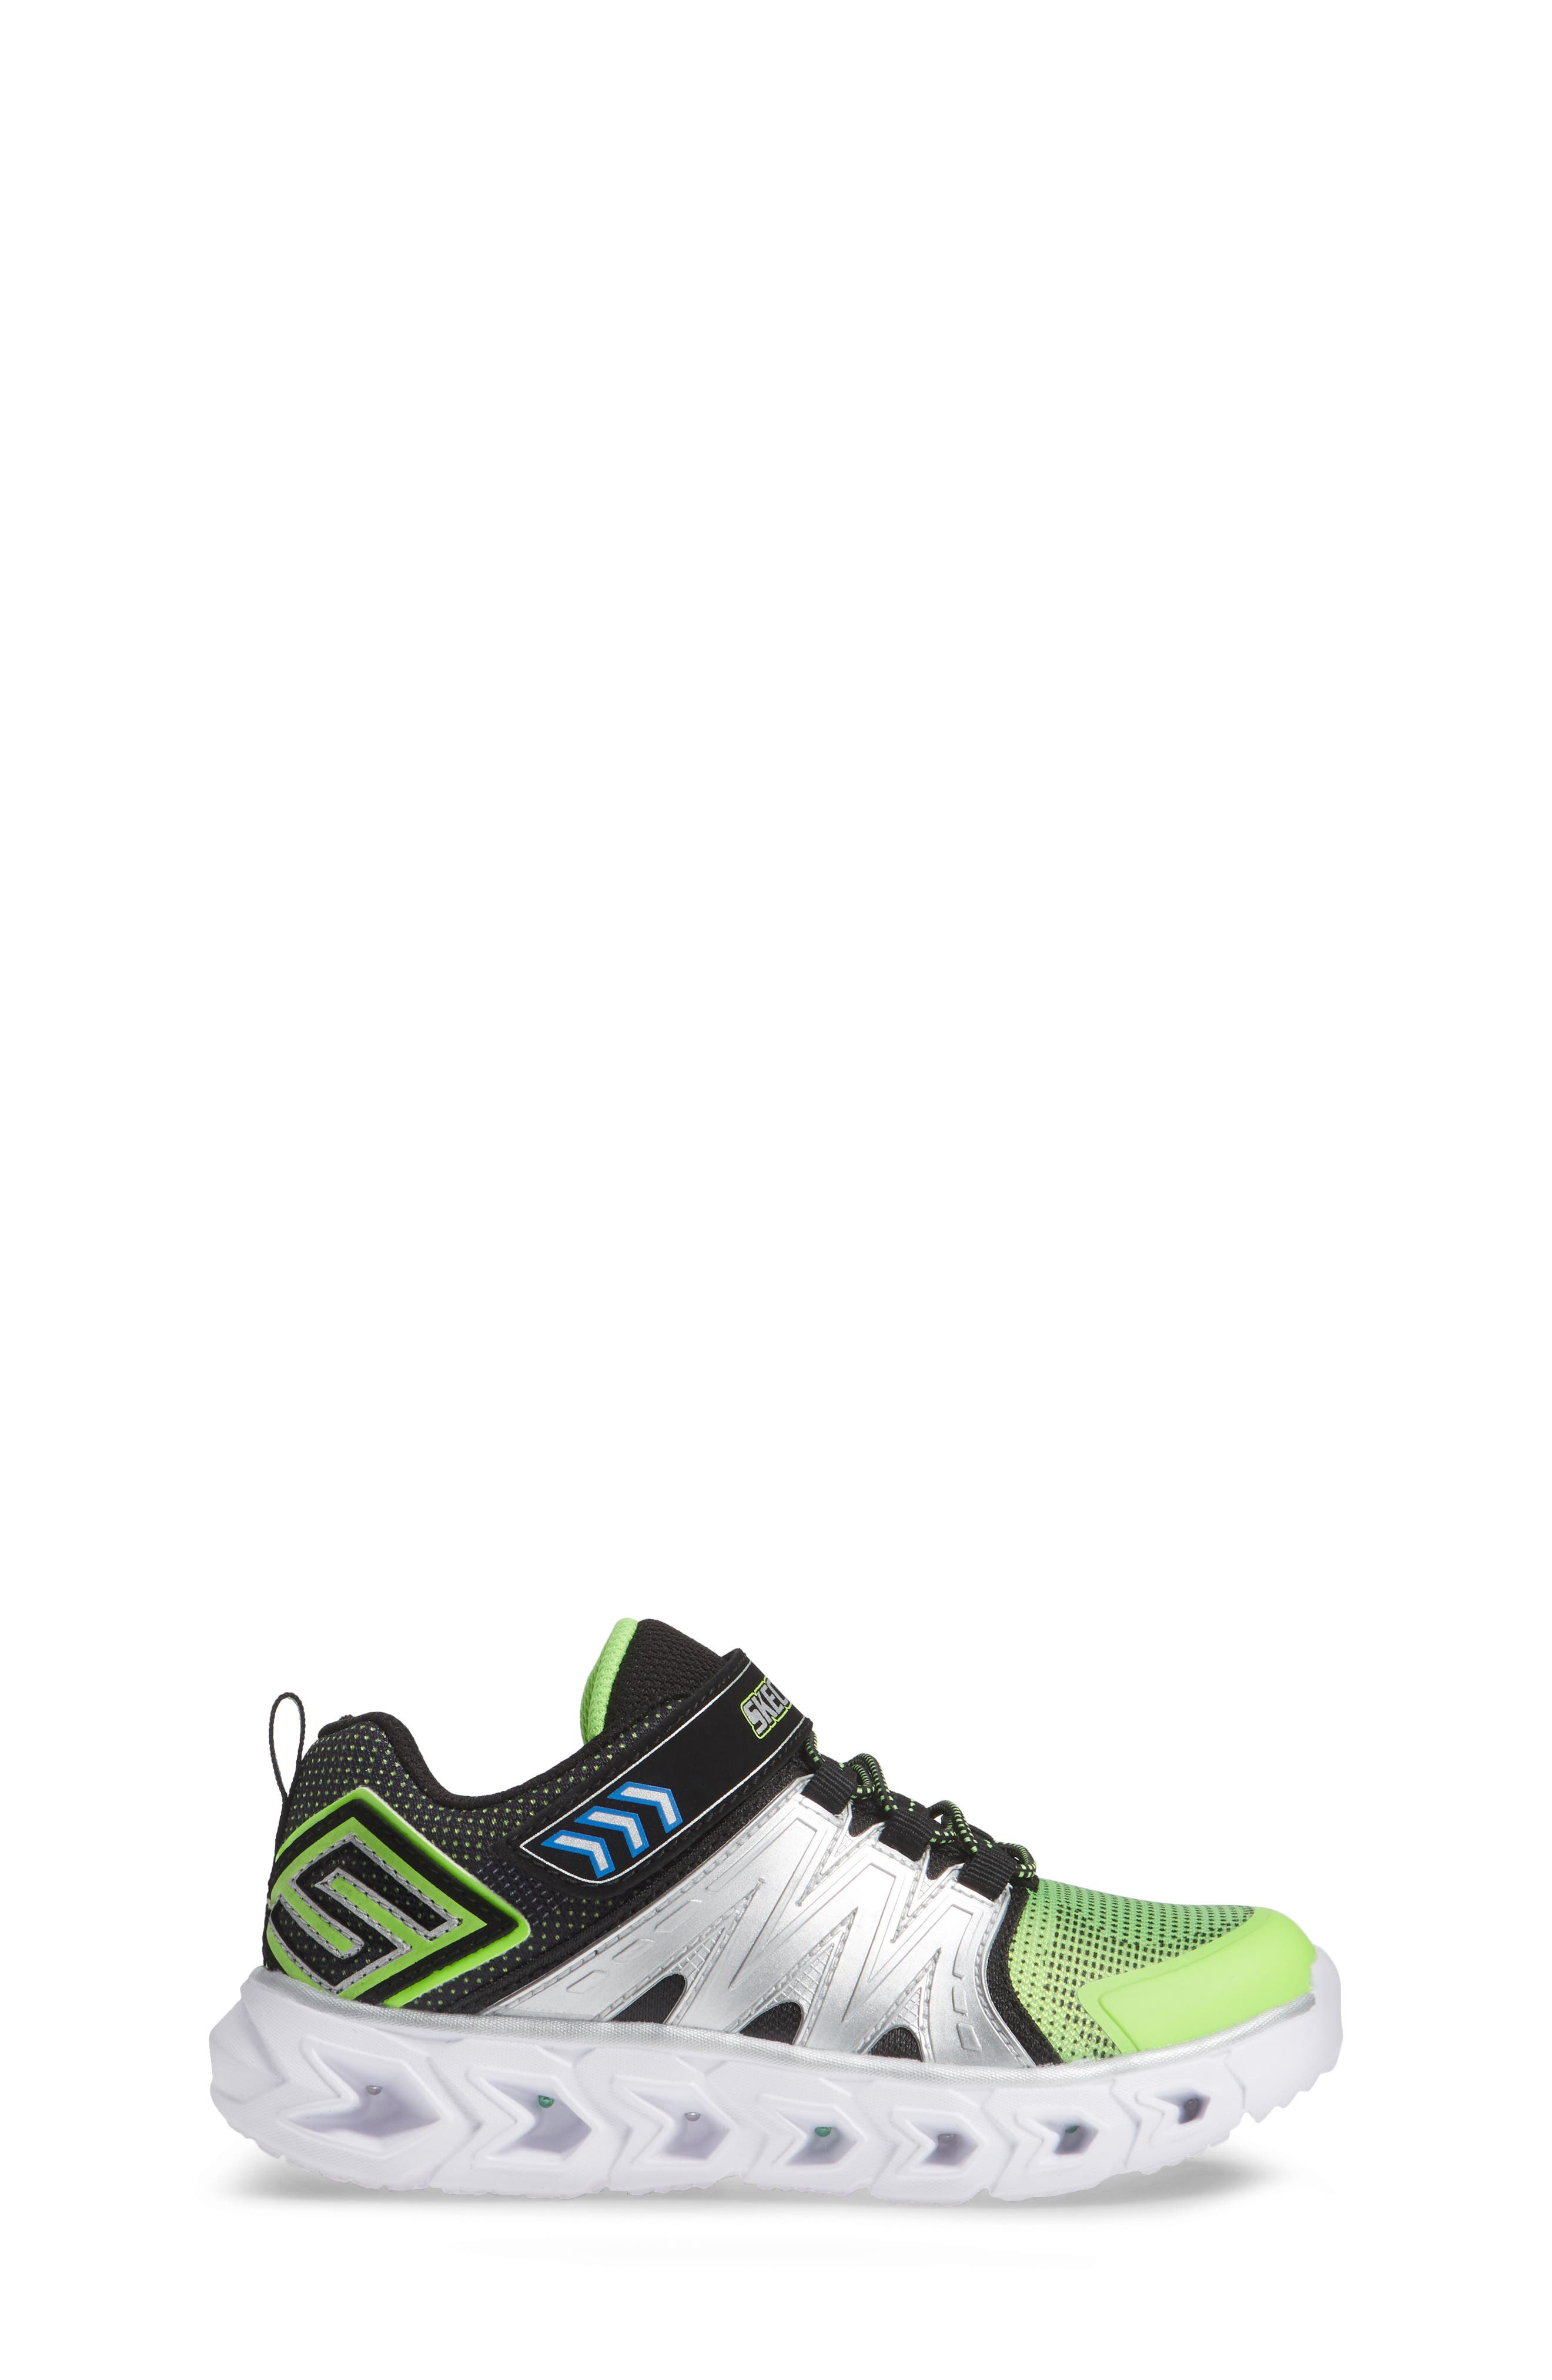 Hypno-Flash 2.0 Sneakers,                             Alternate thumbnail 3, color,                             Lime/ Black